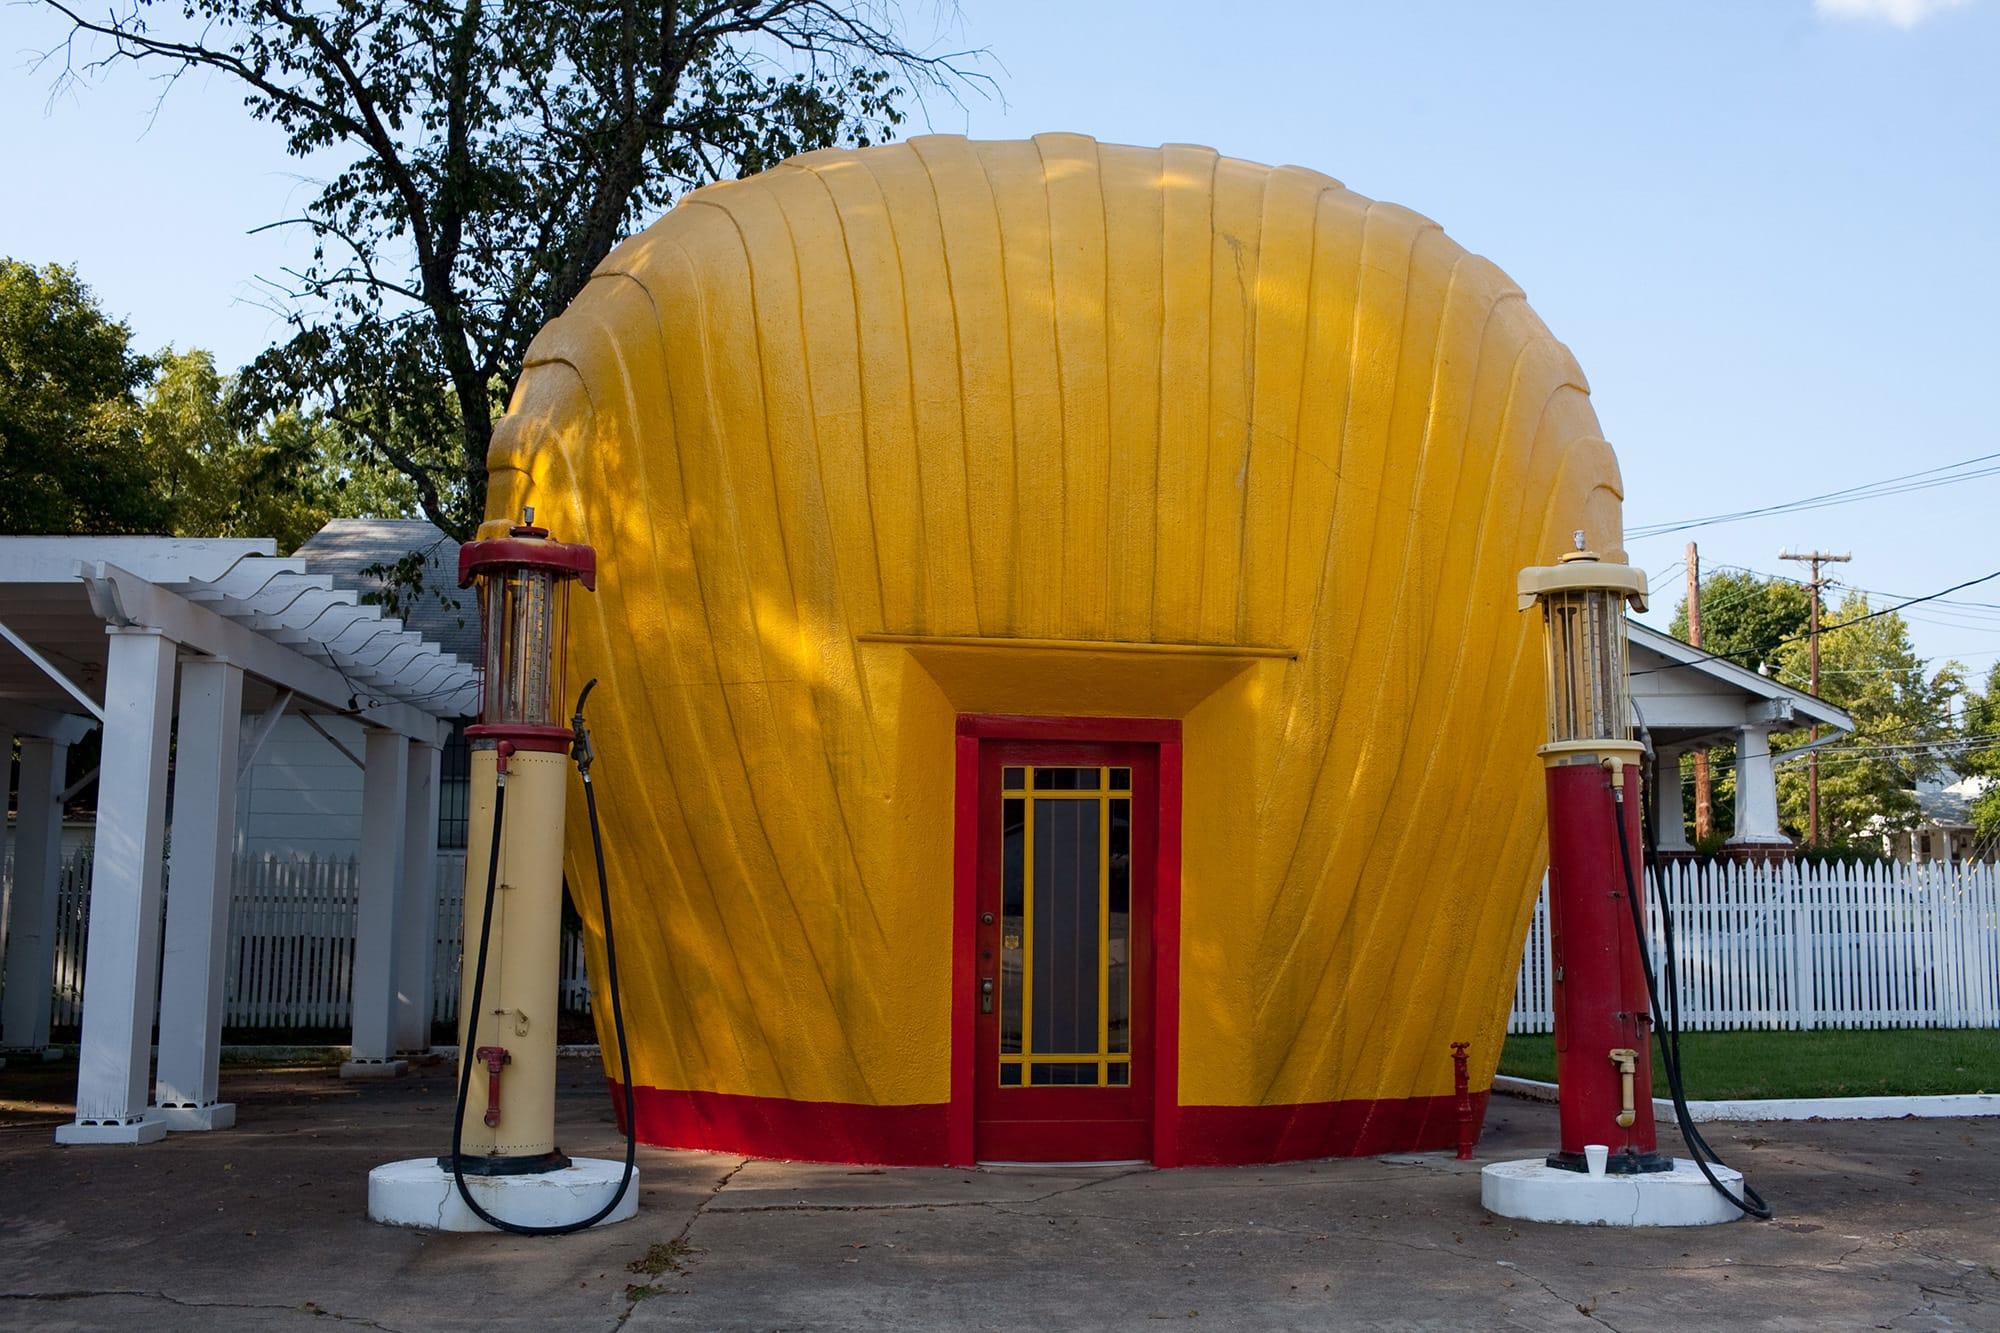 Virginia/North Carolina Road Trip - Shell-Shaped Gas Station